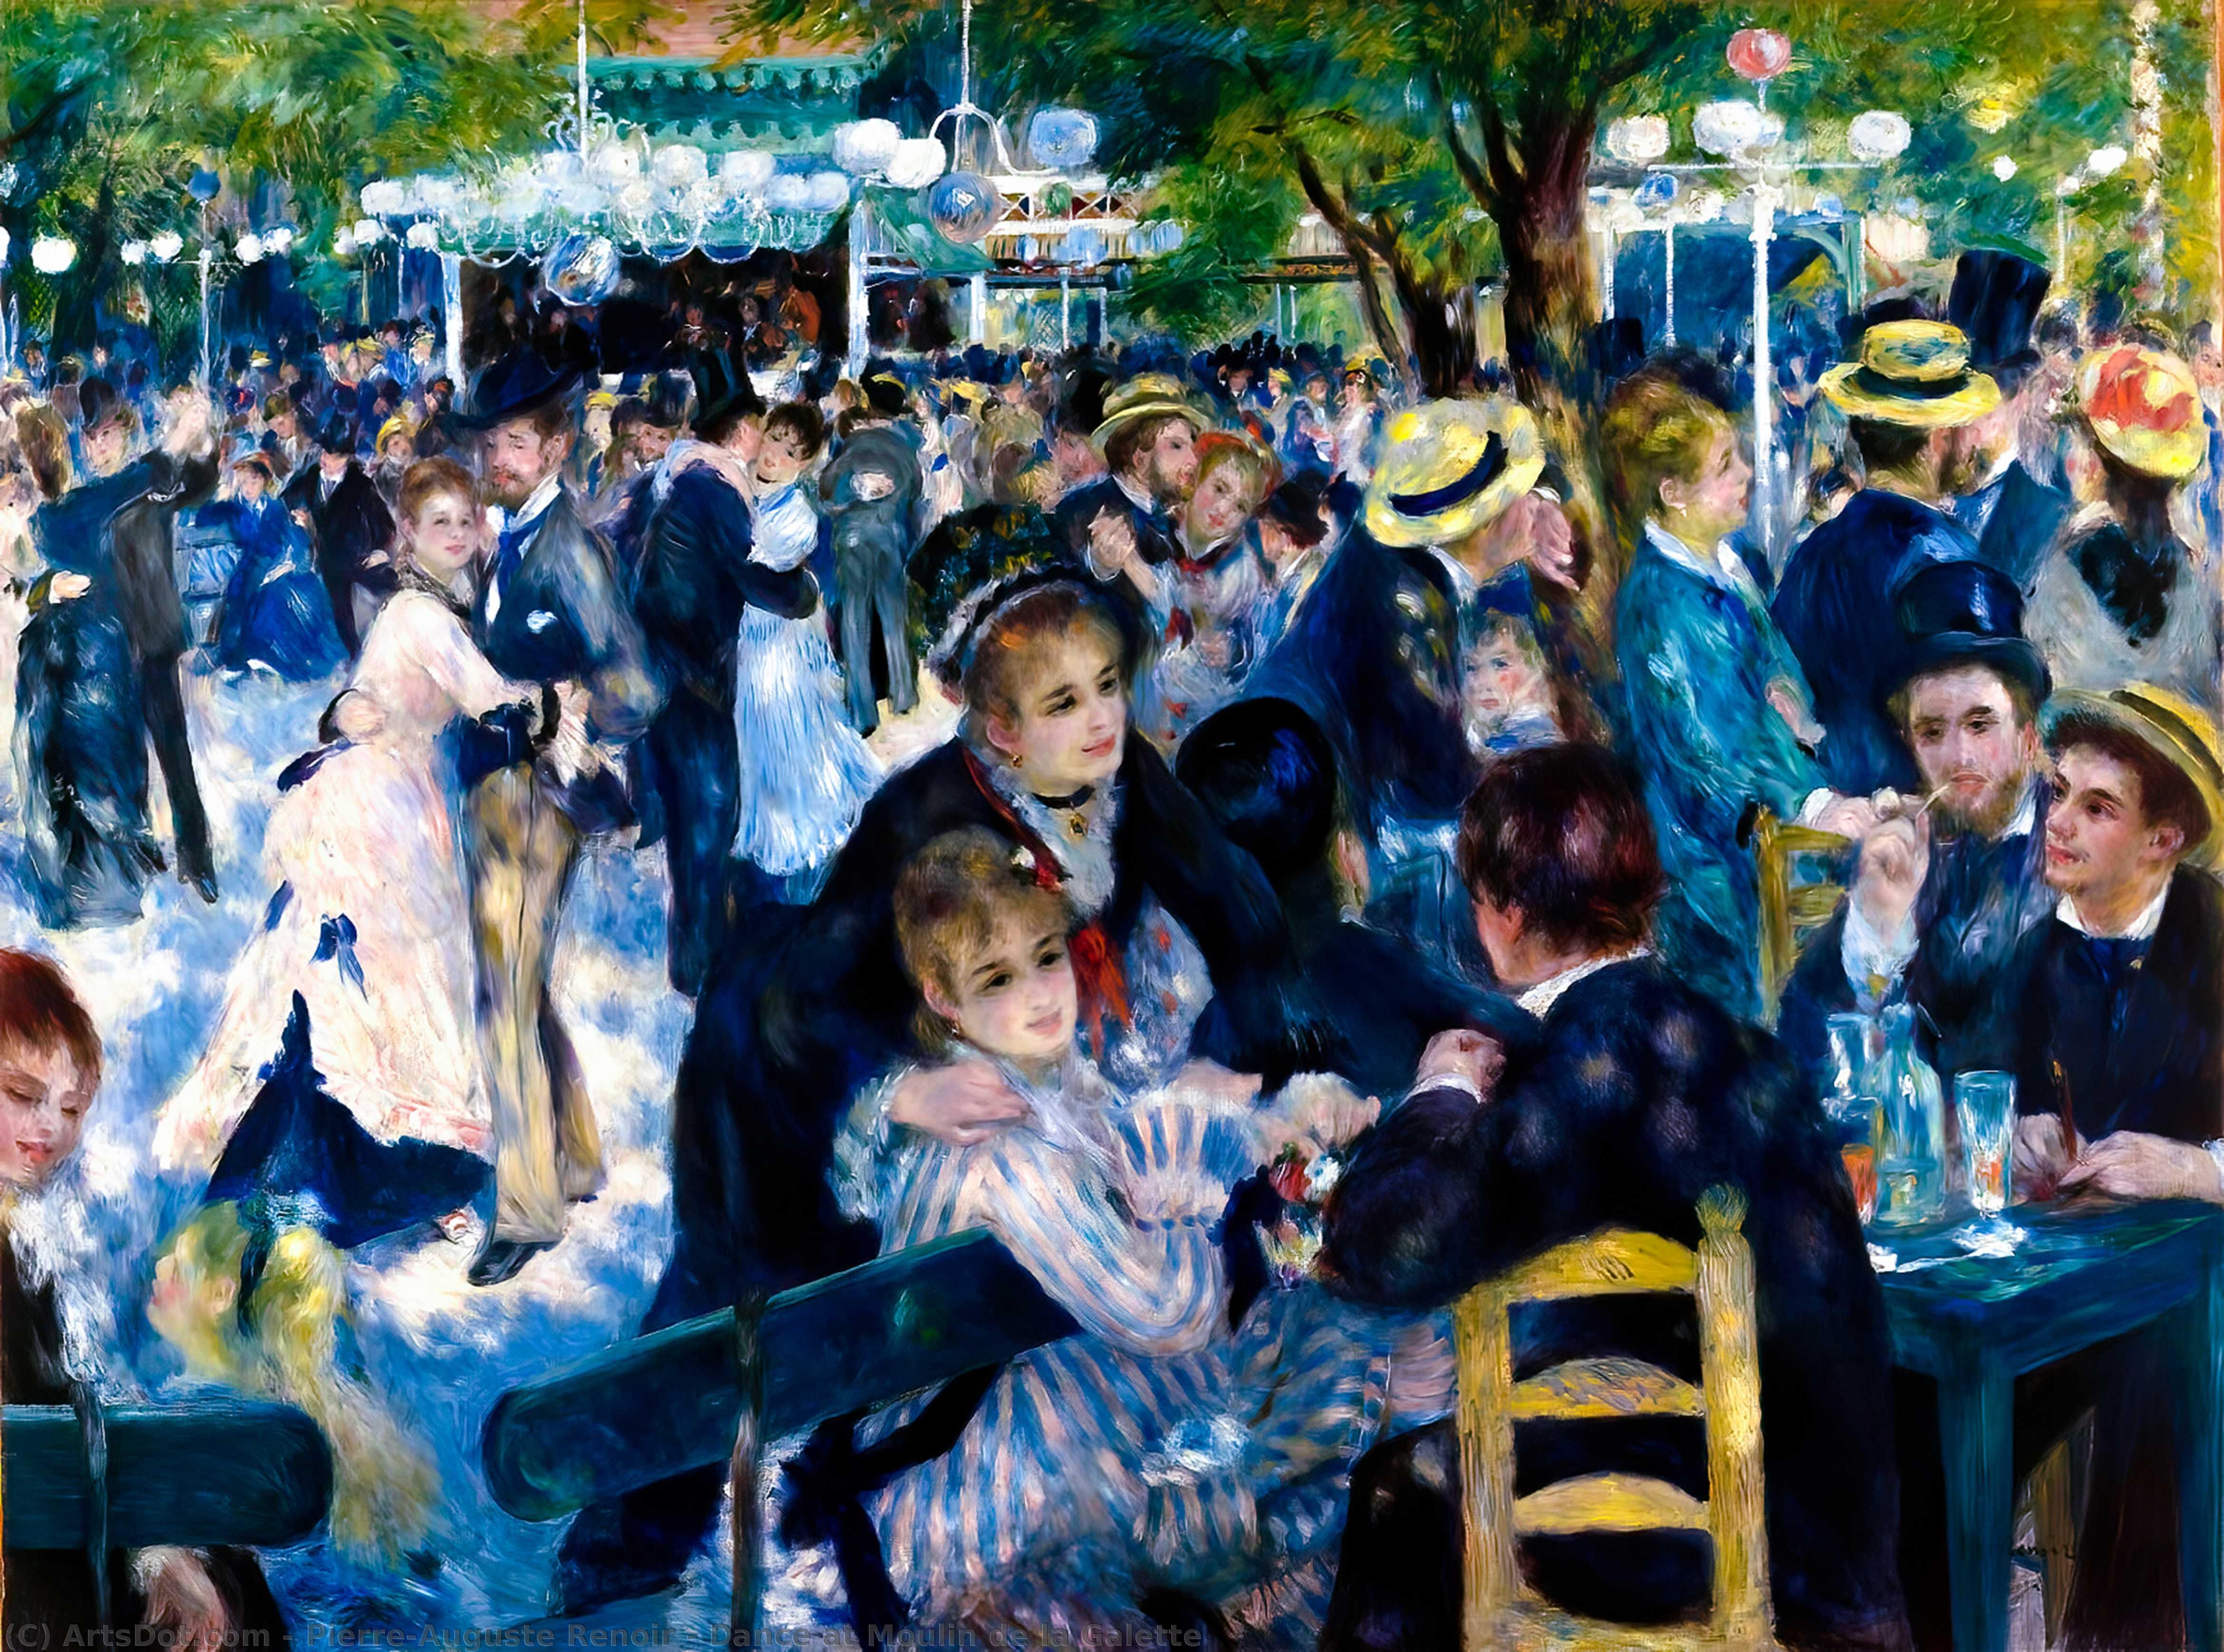 Wikoo.org - موسوعة الفنون الجميلة - اللوحة، العمل الفني Pierre-Auguste Renoir - Dance at Moulin de la Galette